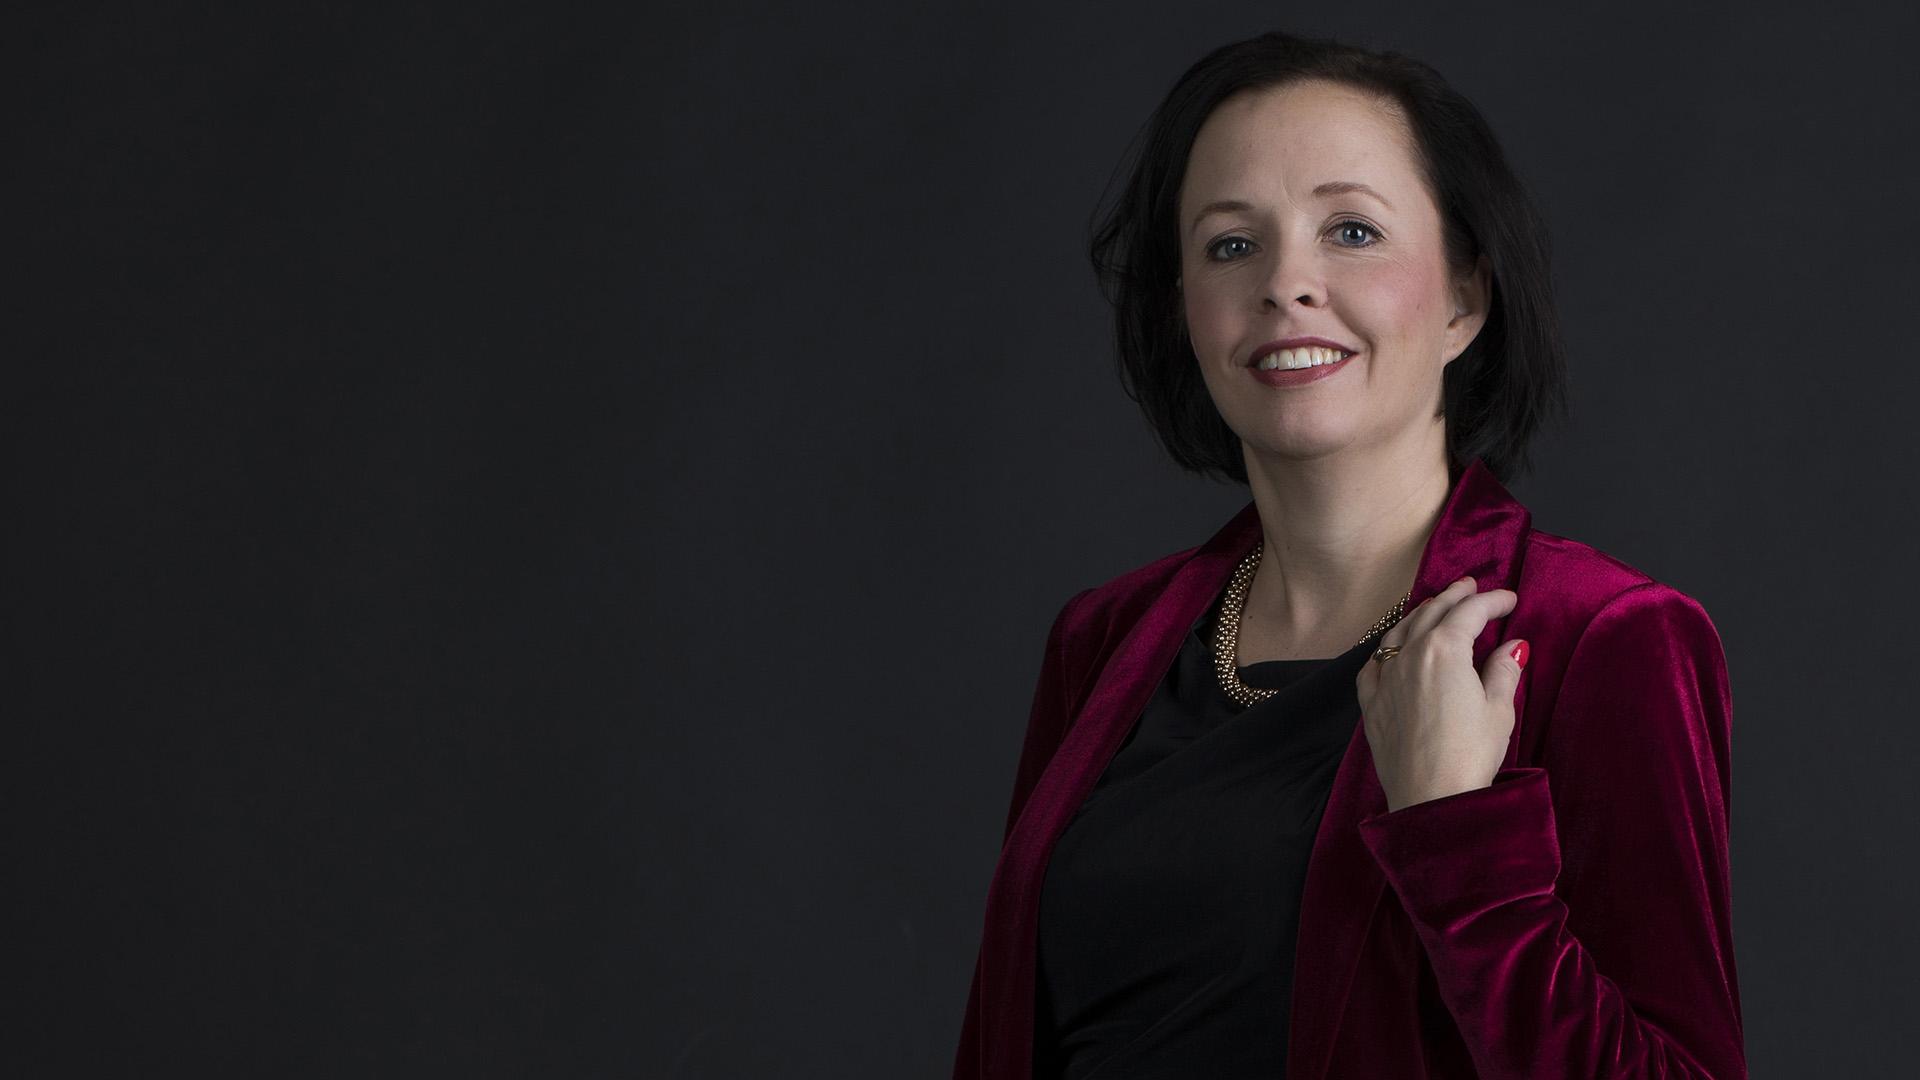 Emilie Gardberg